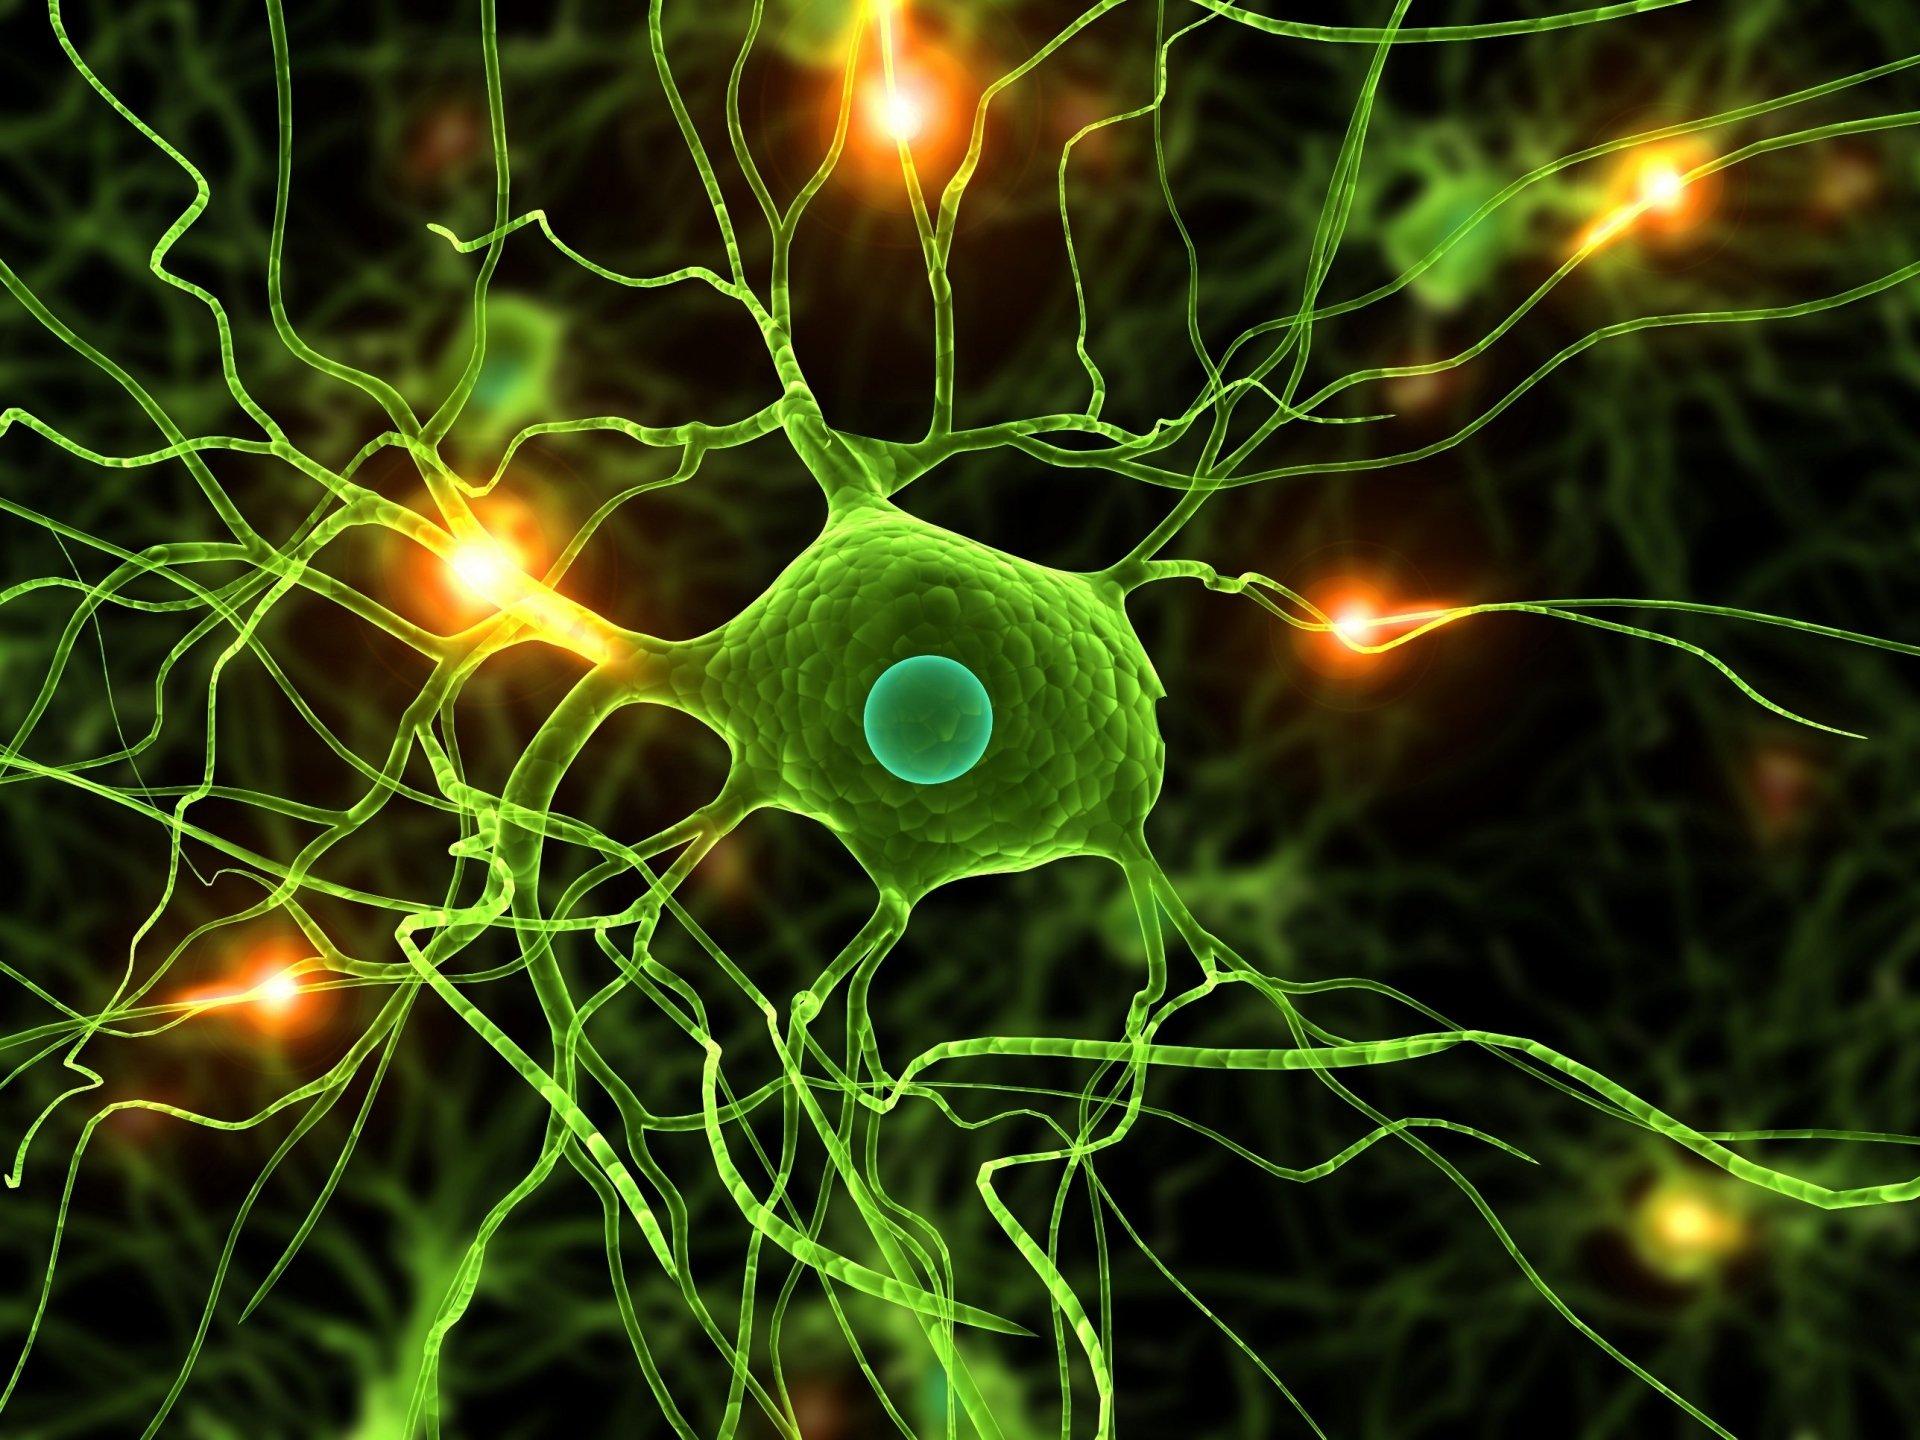 Artistic - Neuron  Wallpaper